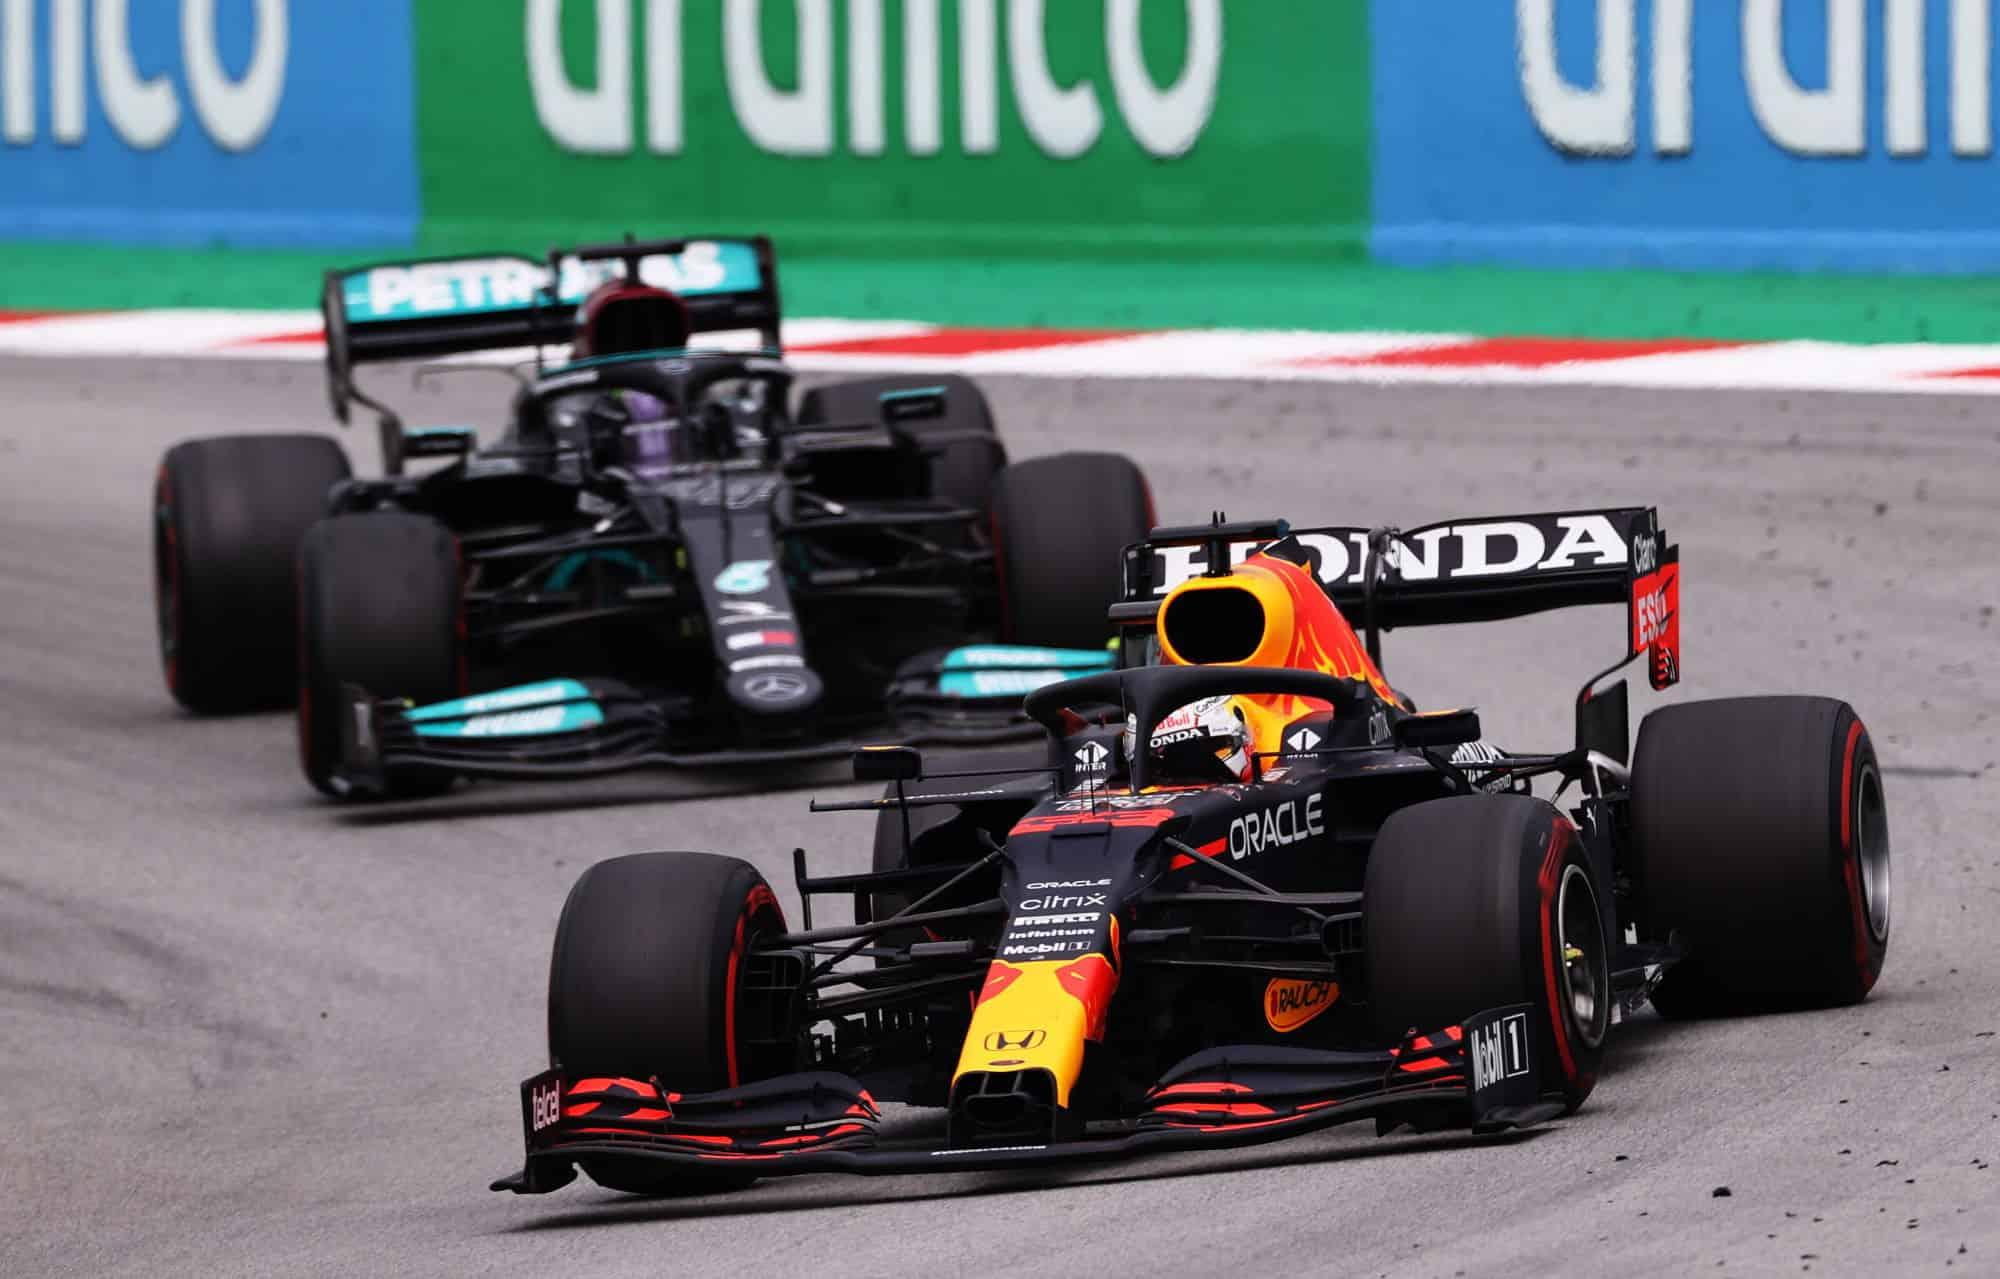 2021 Spanish GP Verstappen leads Hamilton race Photo Red Bull